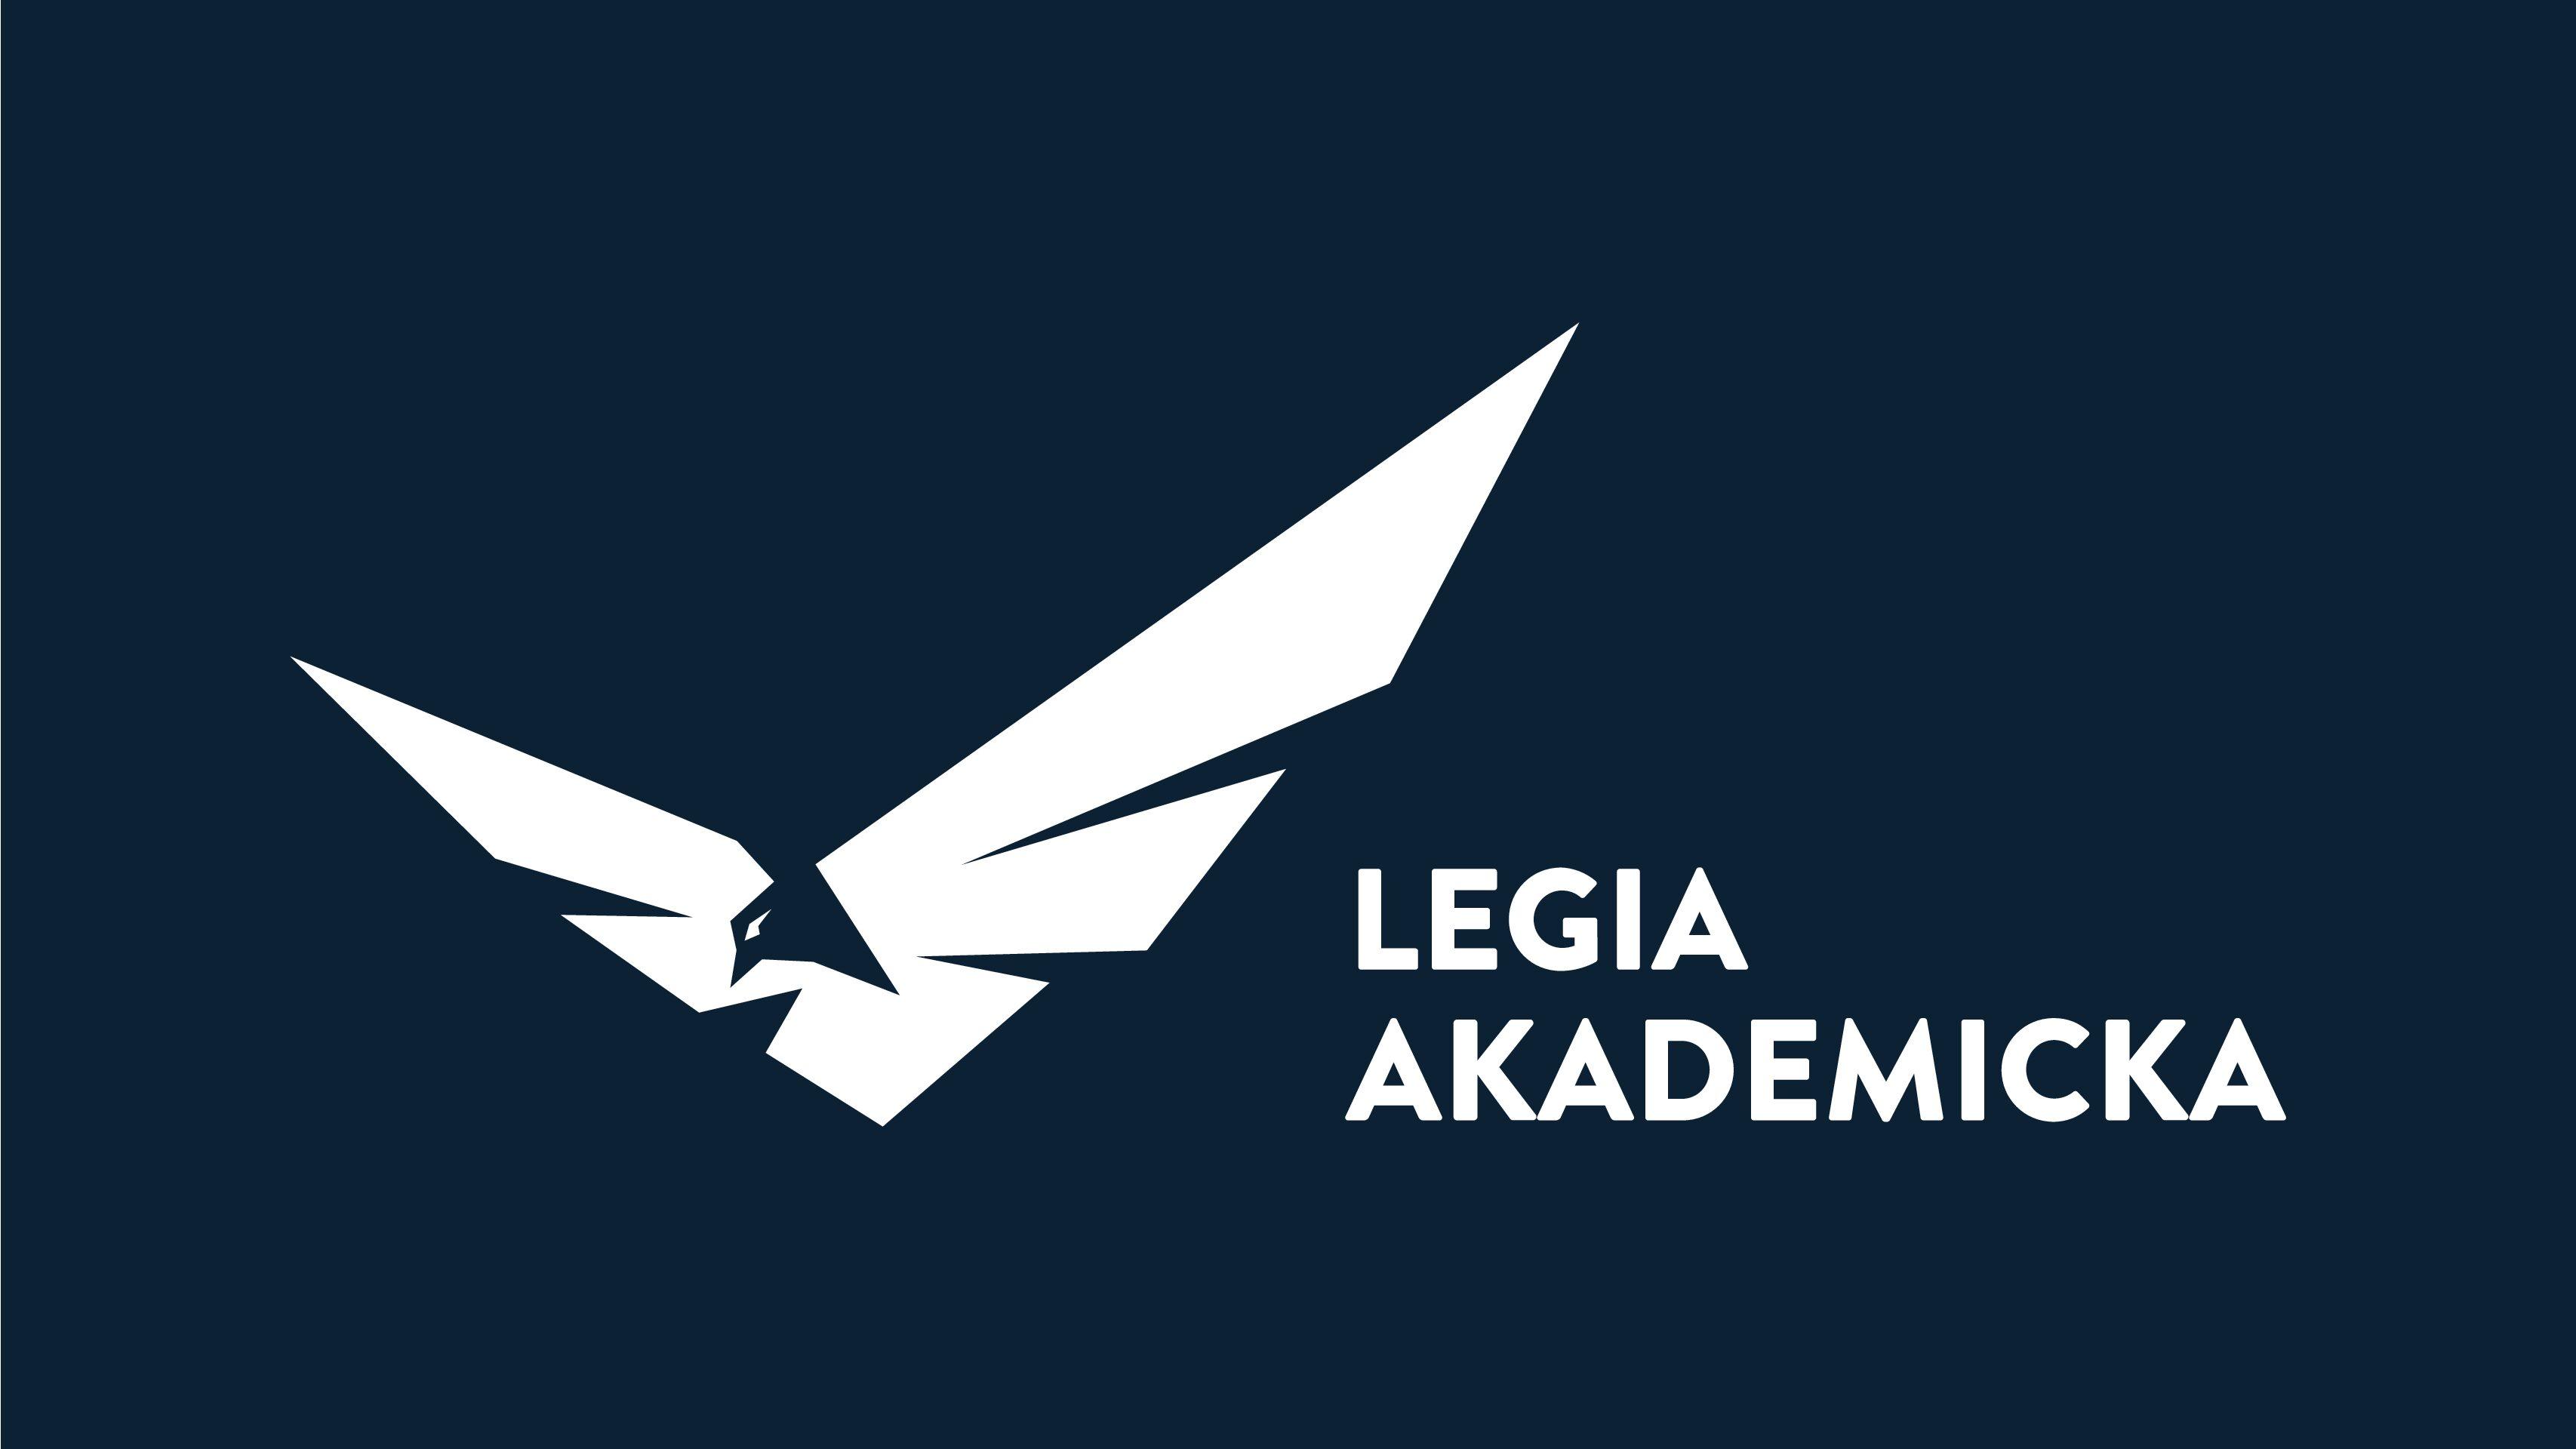 Legia Akademicka